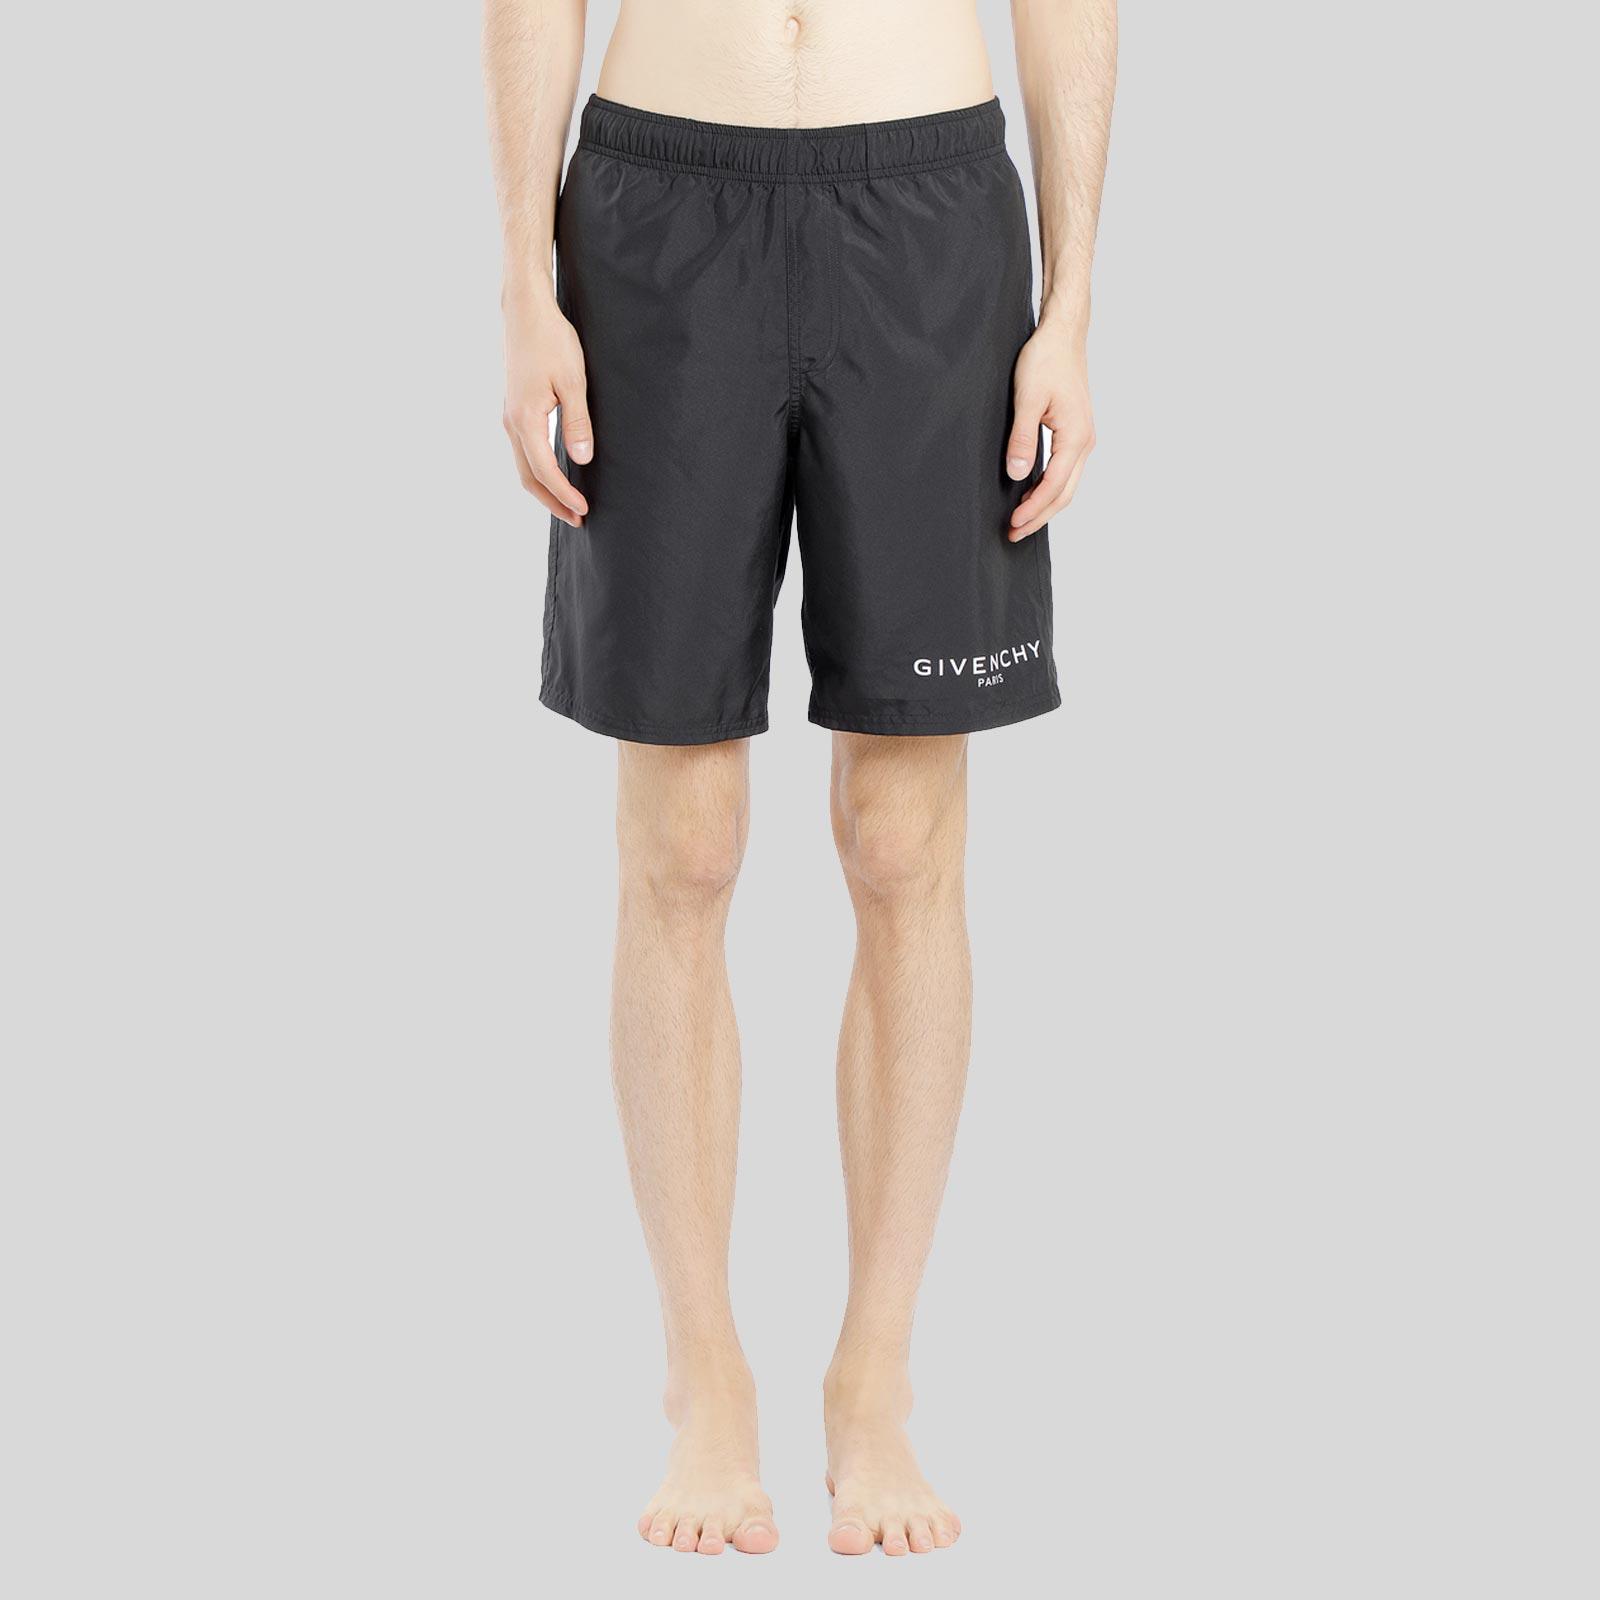 e9192ae4aab2 Hionidis Μαύρο GIVENCHY Swim Shorts GIVENCHY